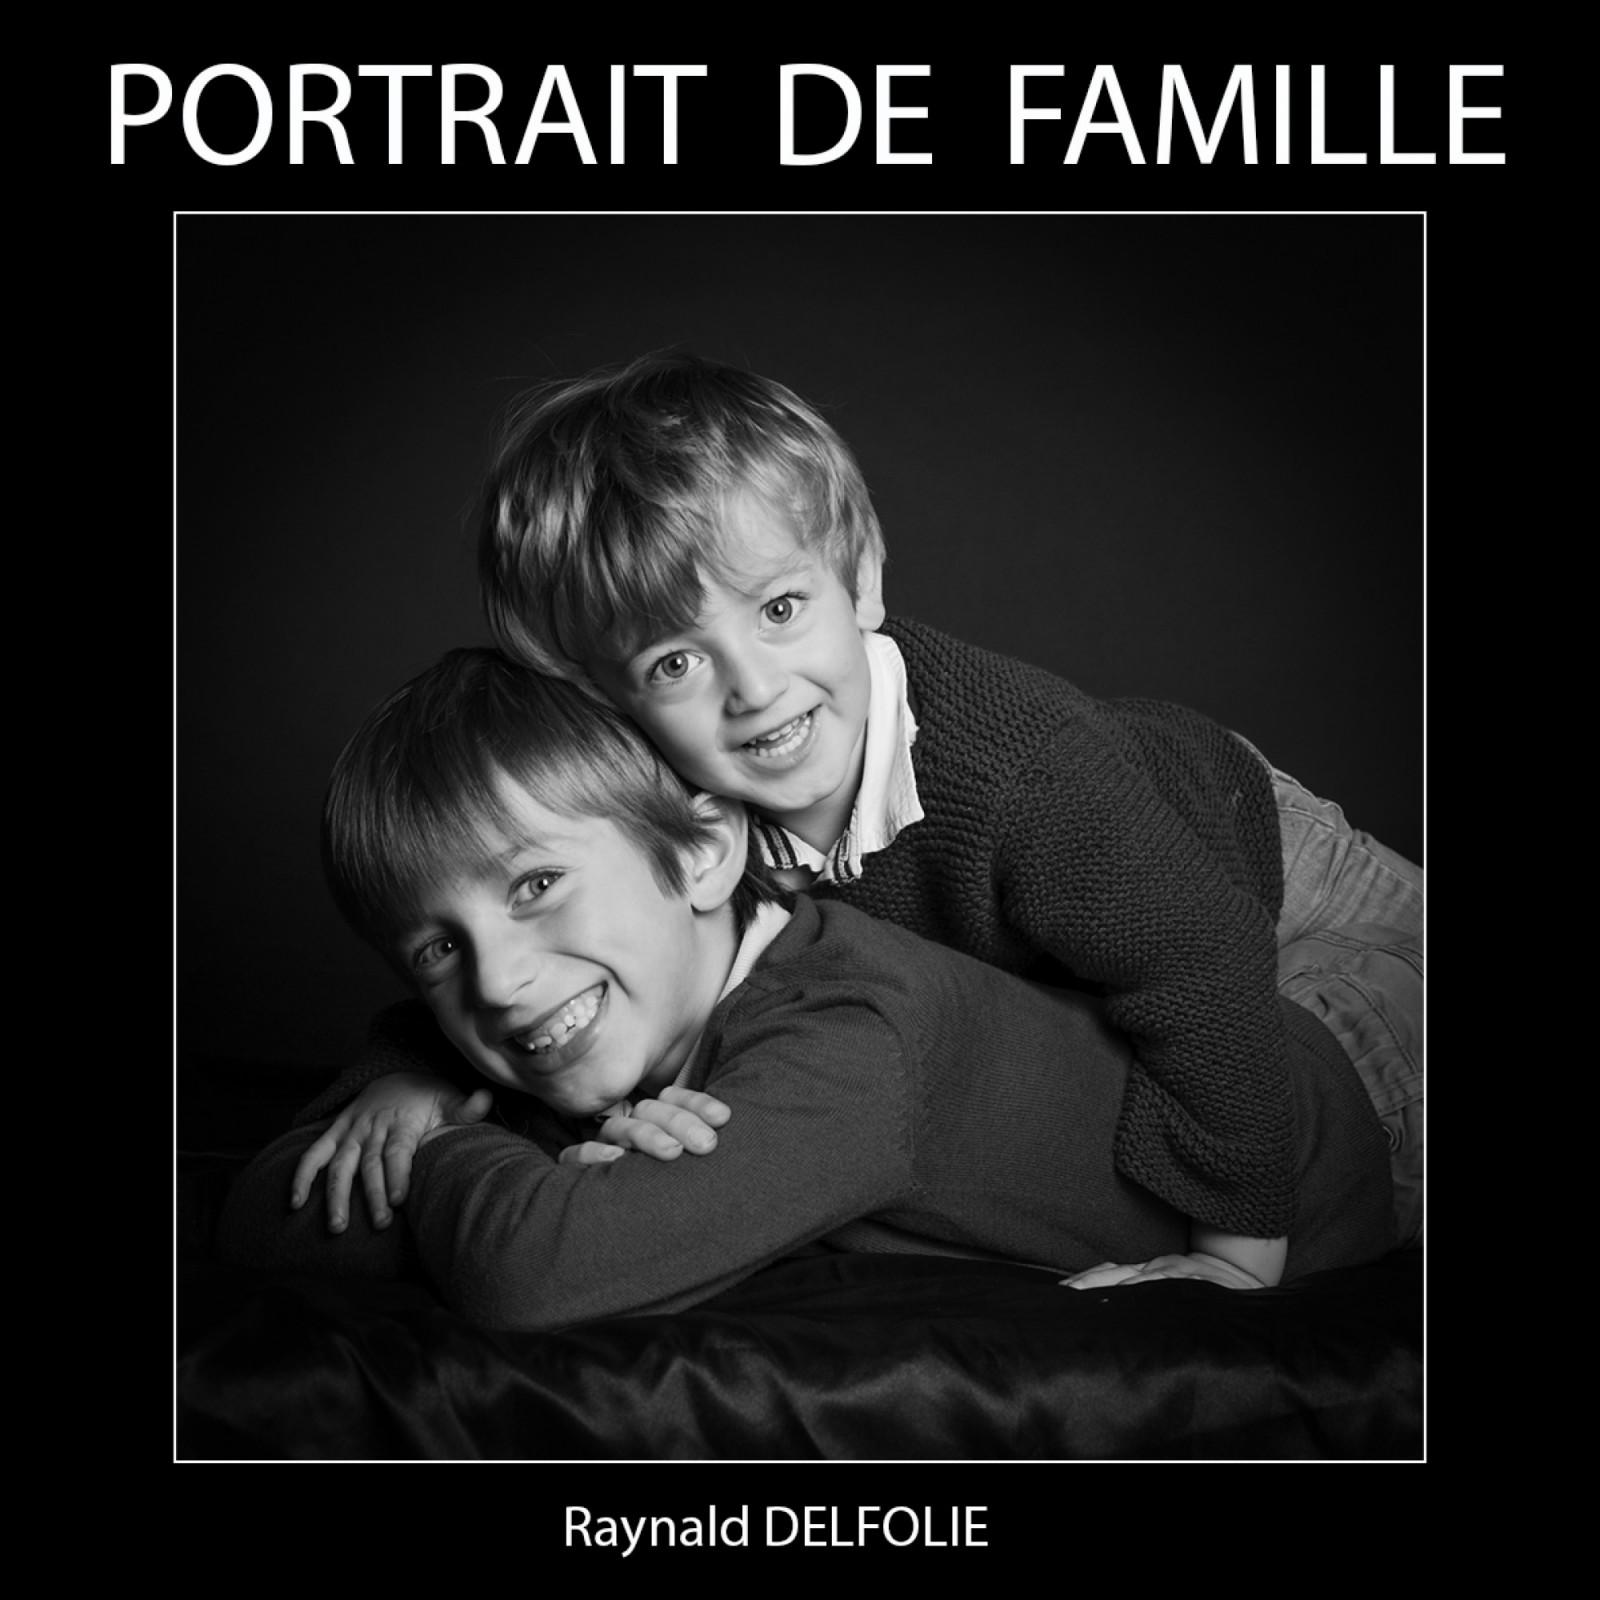 raynald-delfolie d63038c191d9